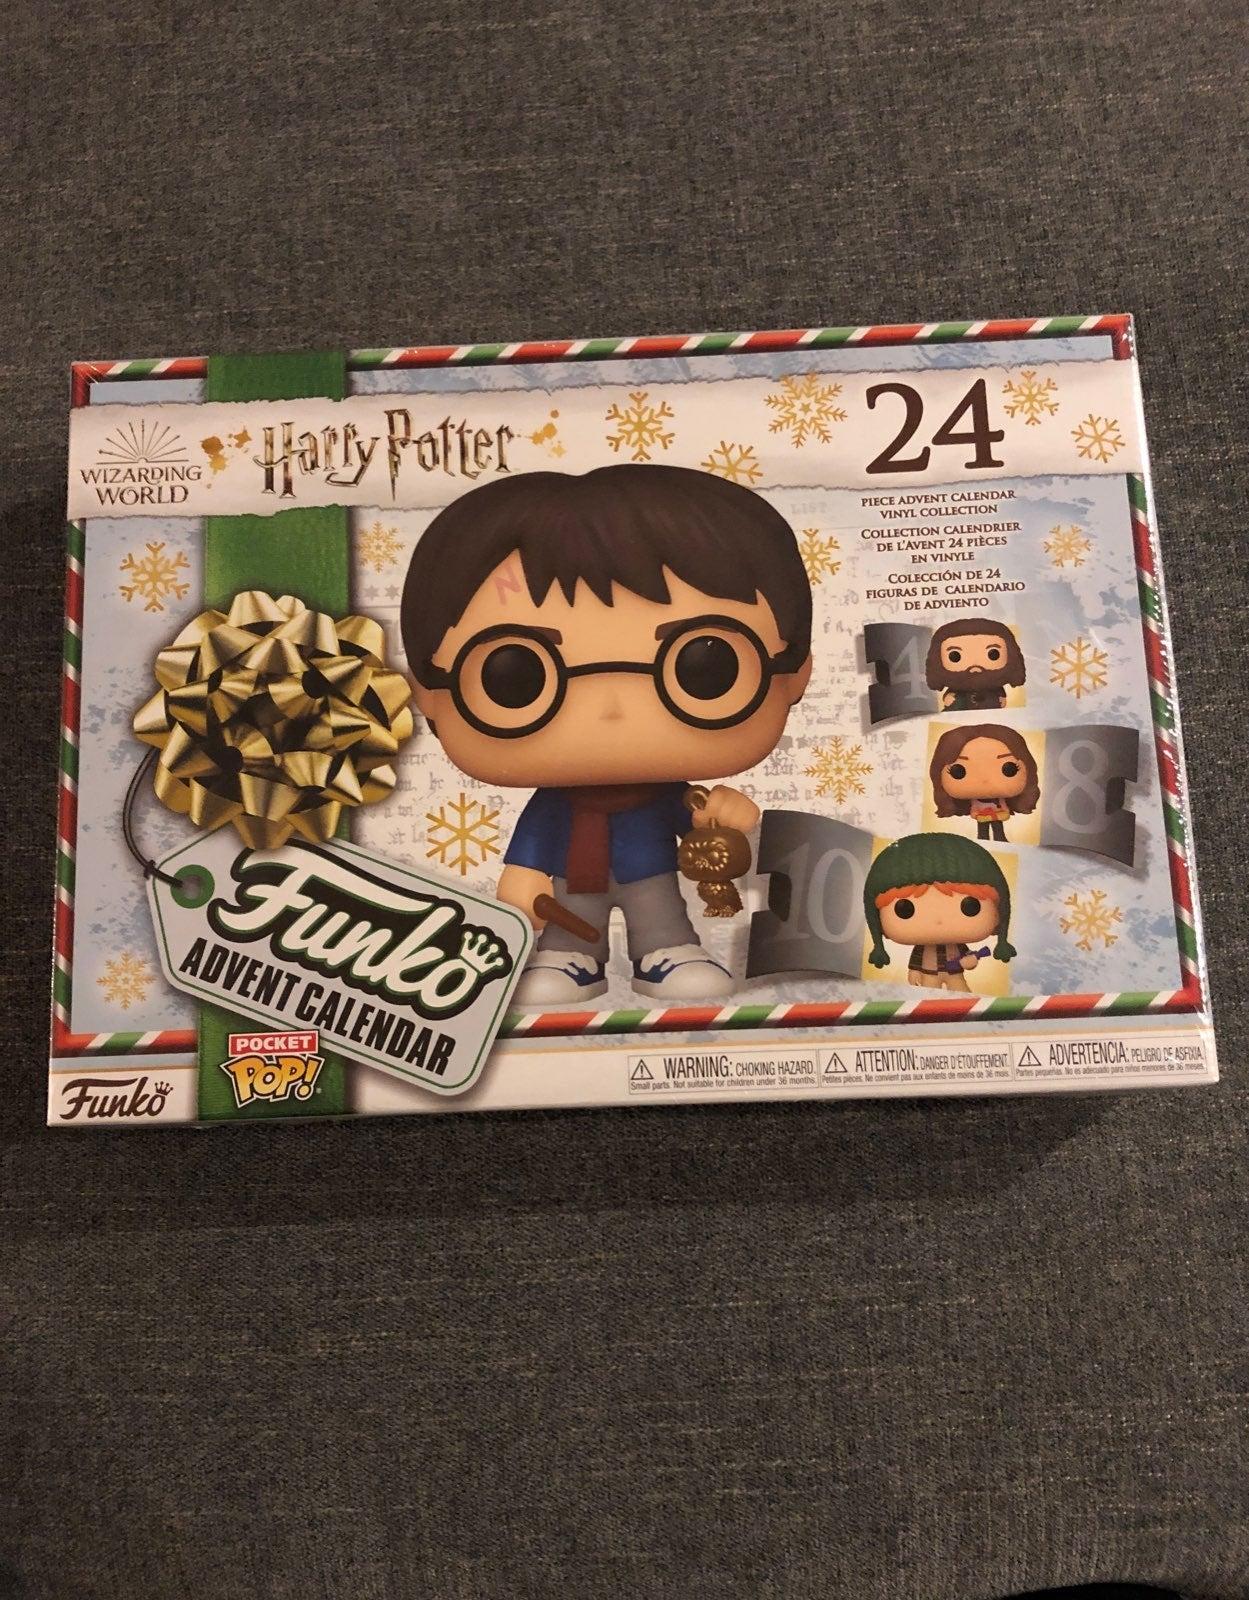 Harry Potter 2020 Pocket Pop! Advent